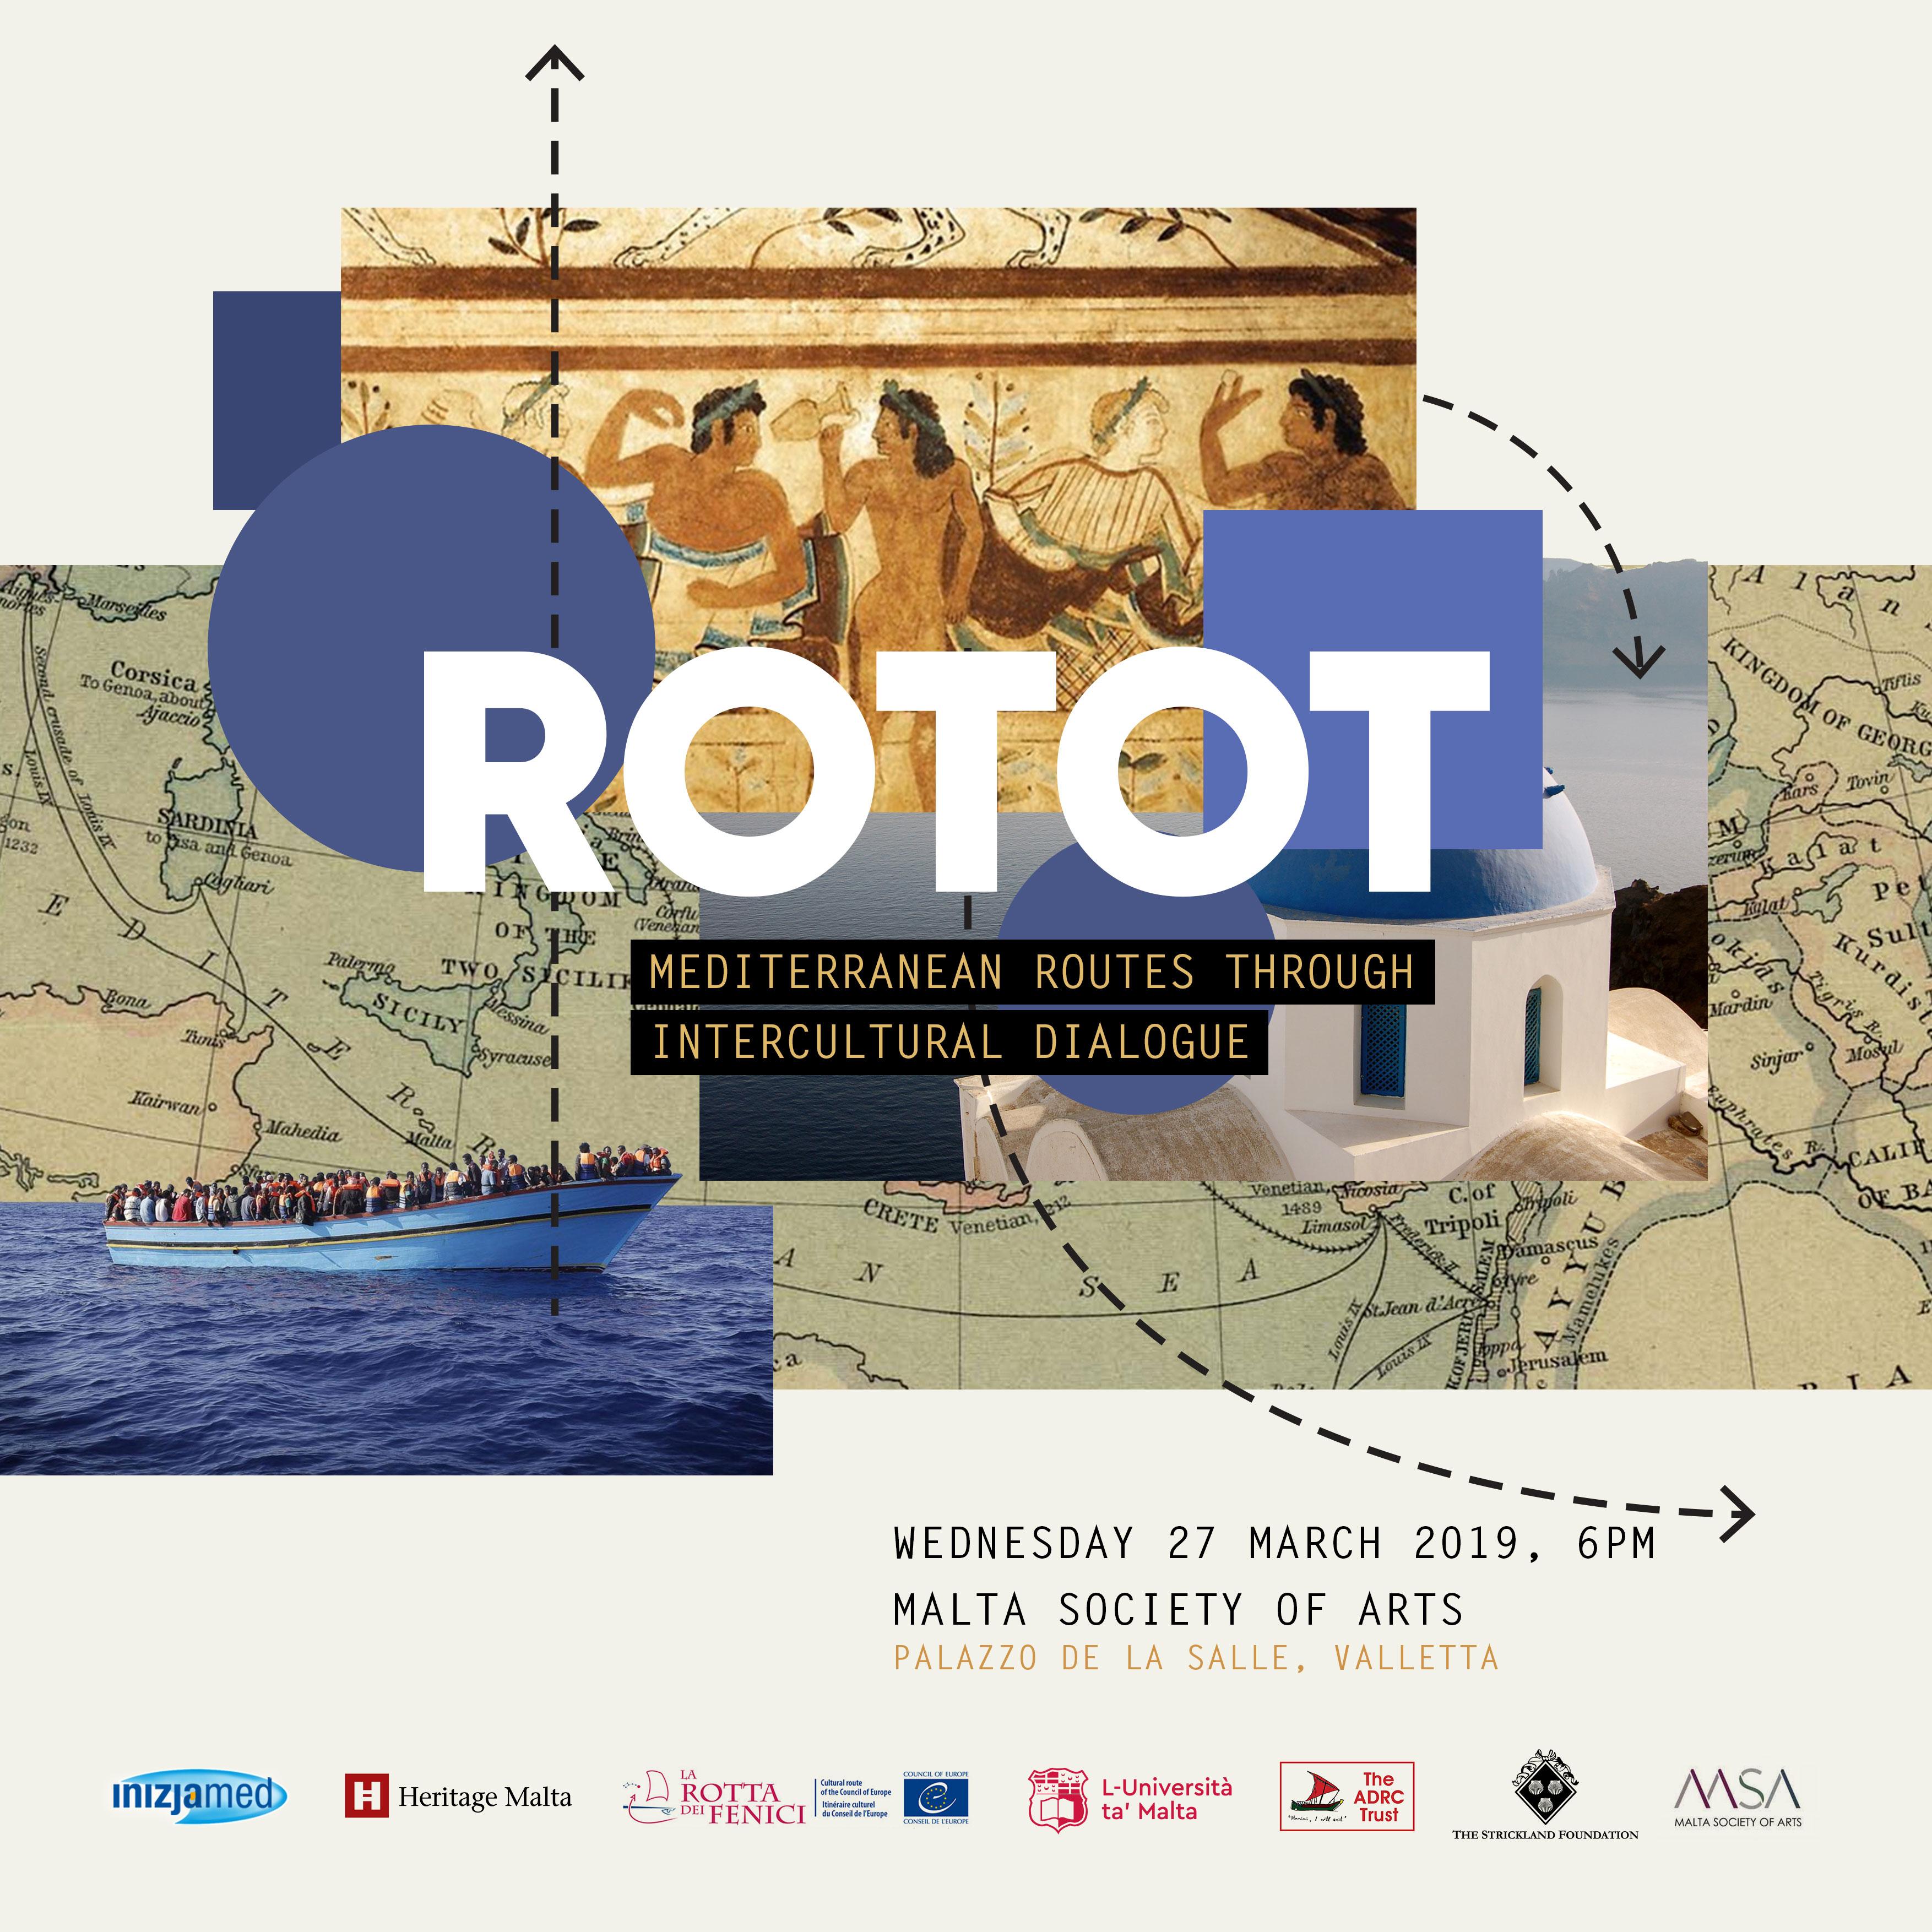 rotot-square poster